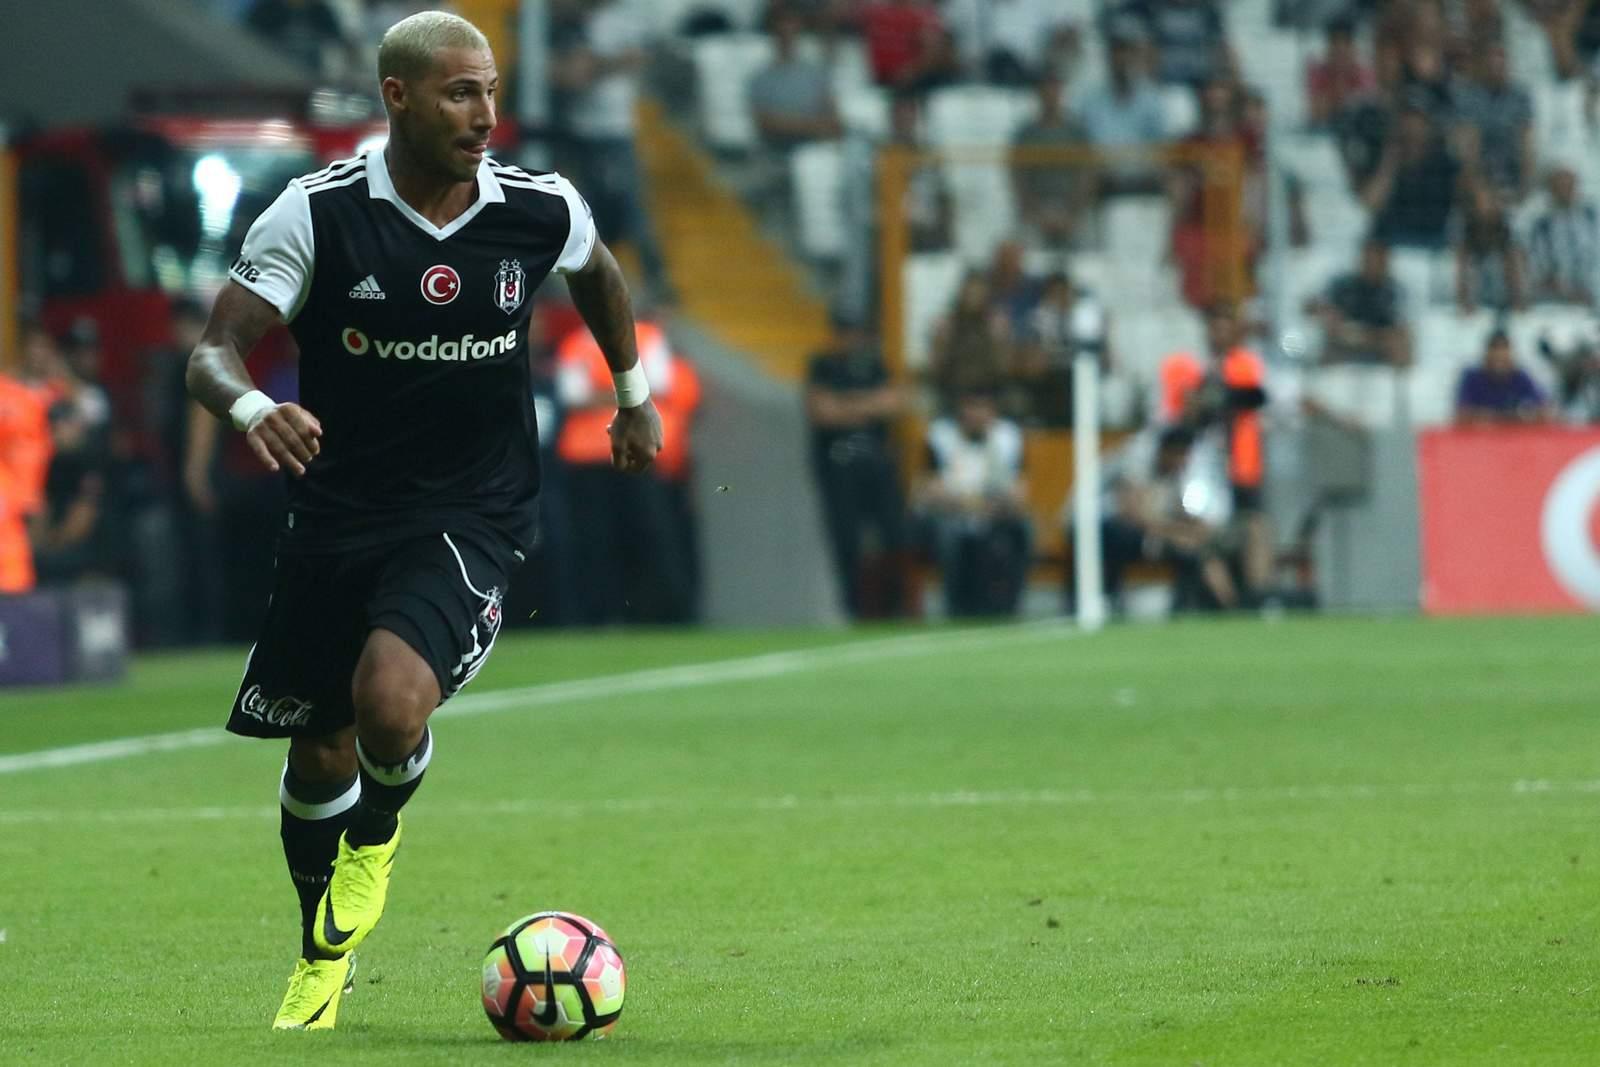 Besiktas VS Lyon BETTING TIPS (20-04-2017)